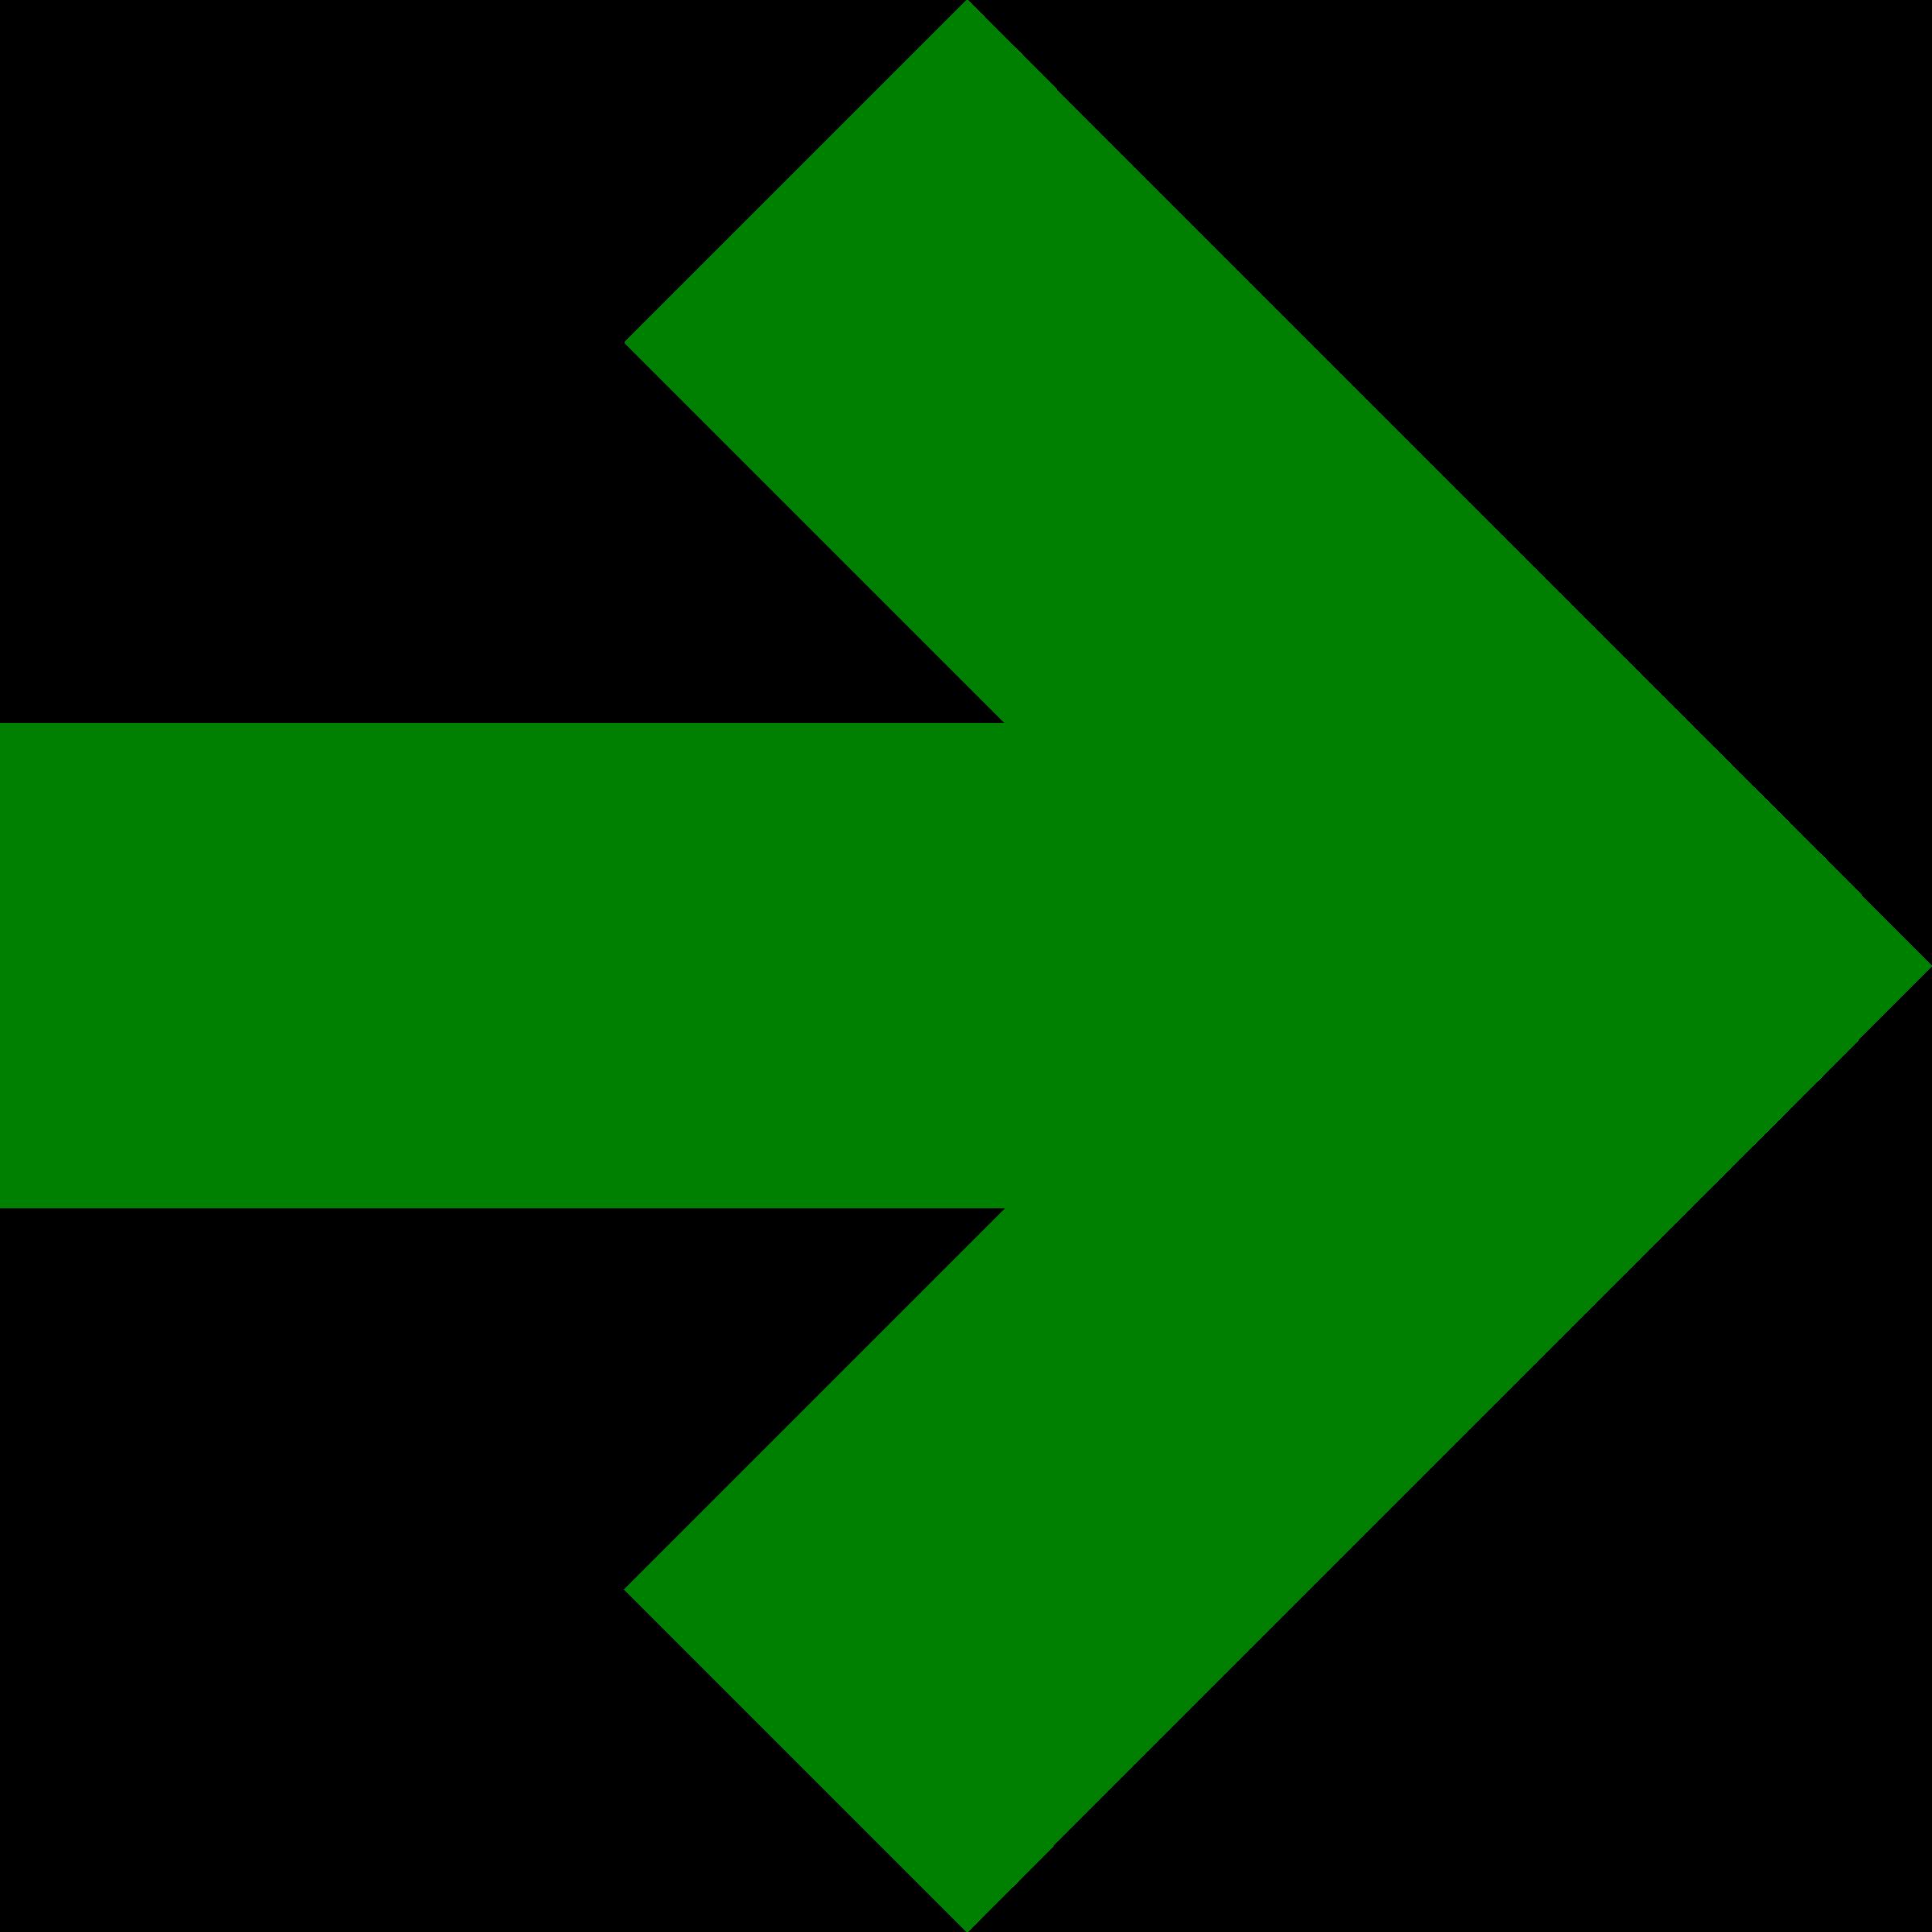 pngkit_arrow-mark-png_214846